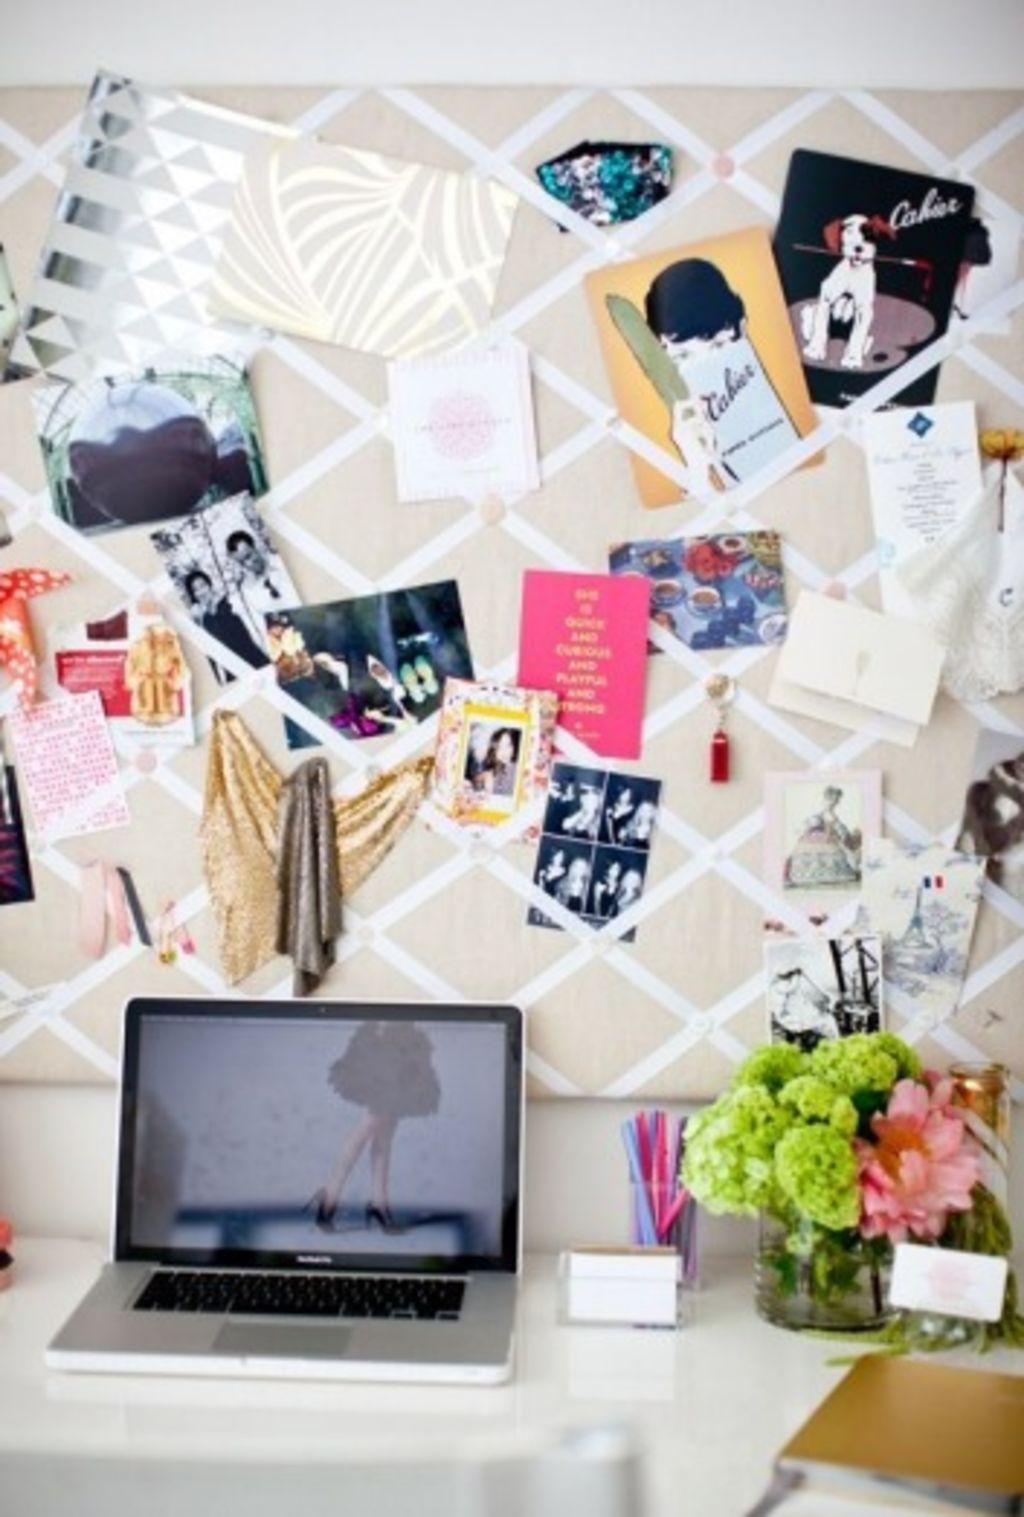 Interior stylist Sarah McGee's home office inspiration board. Photo: Brook Palmer